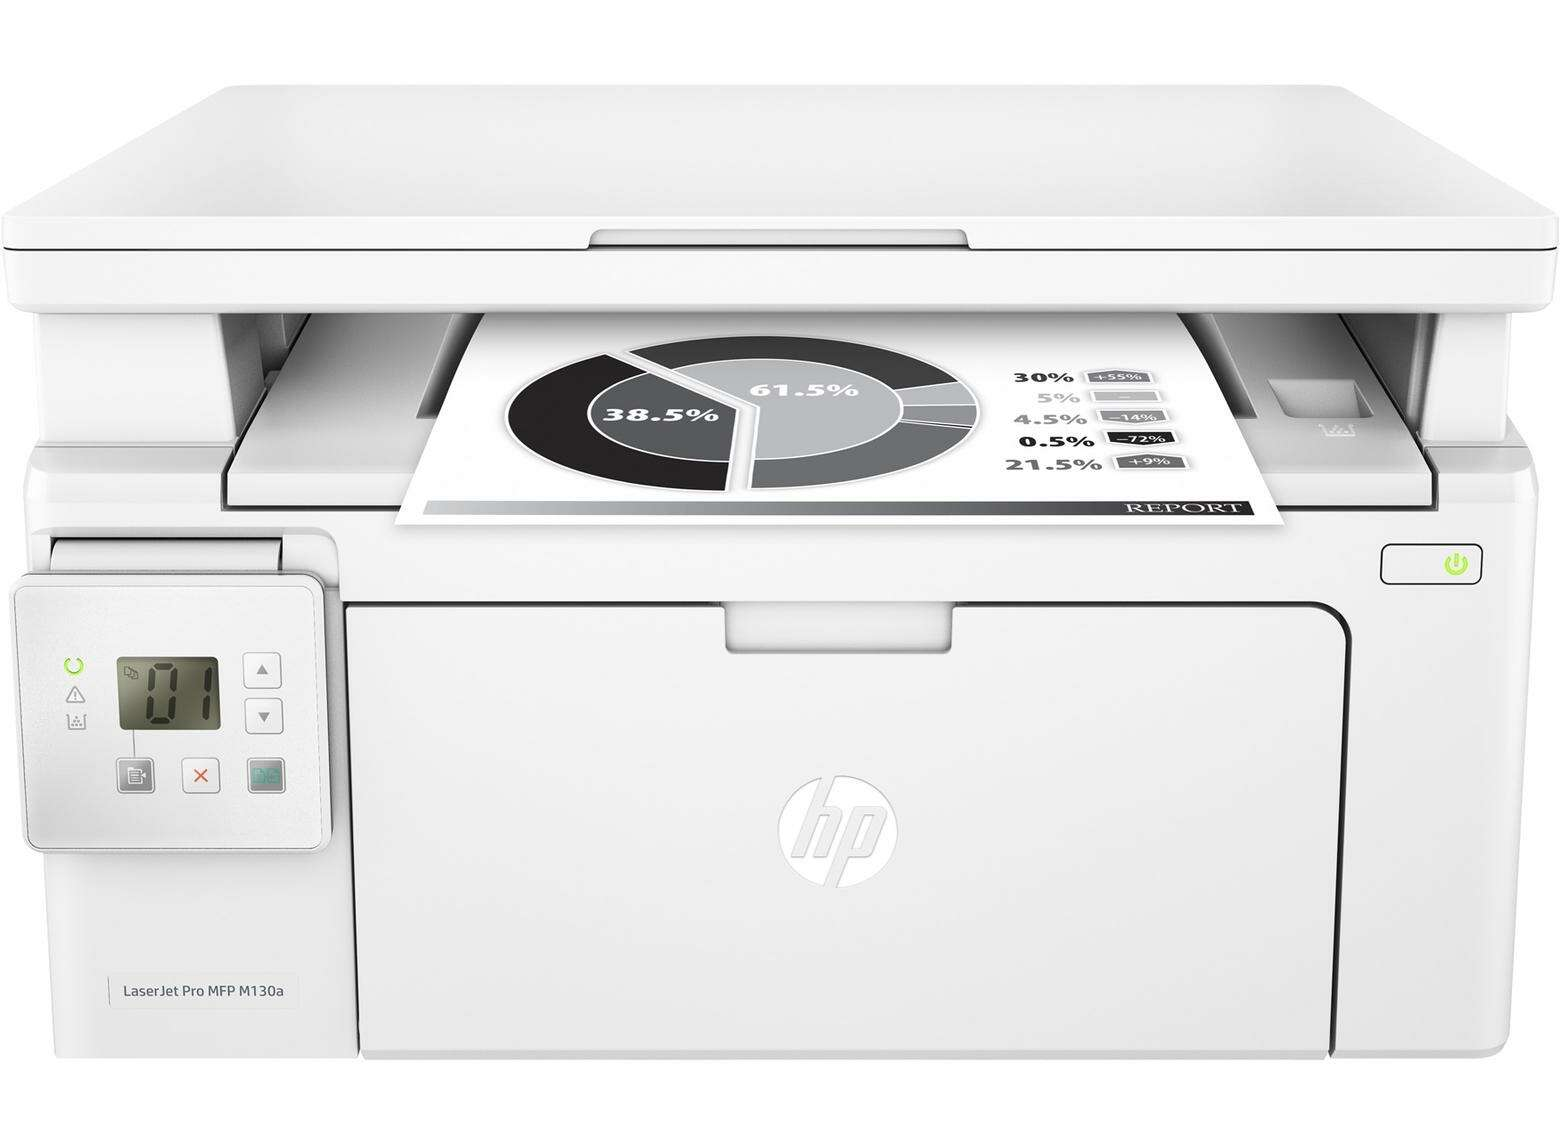 Лазерное МФУ HP LaserJet Pro MFP M130a